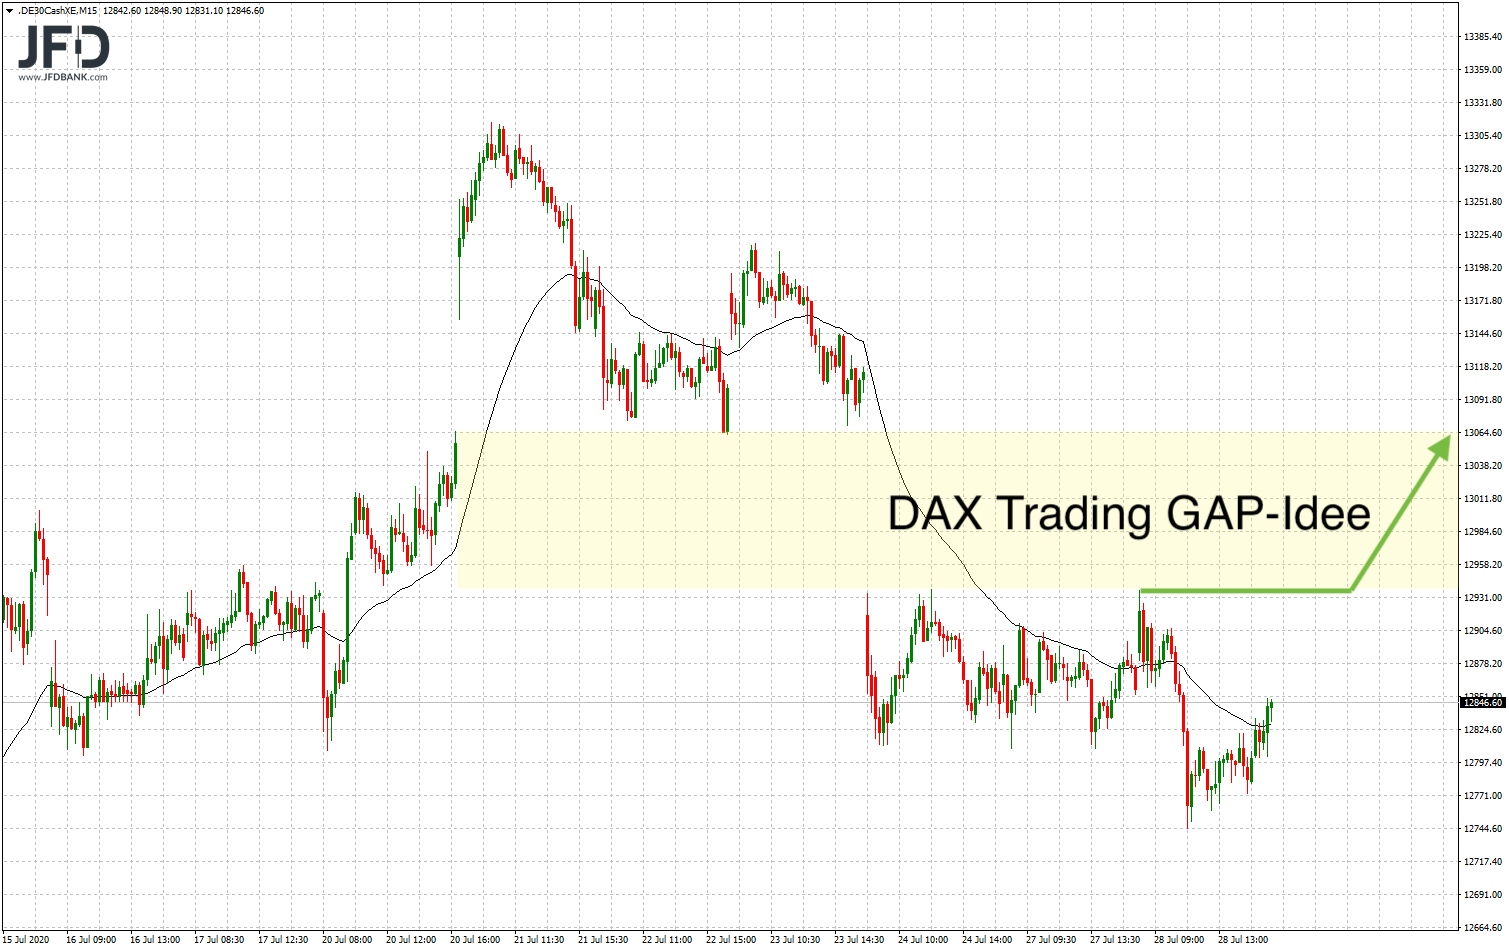 DAX-Tradingidee am GAP